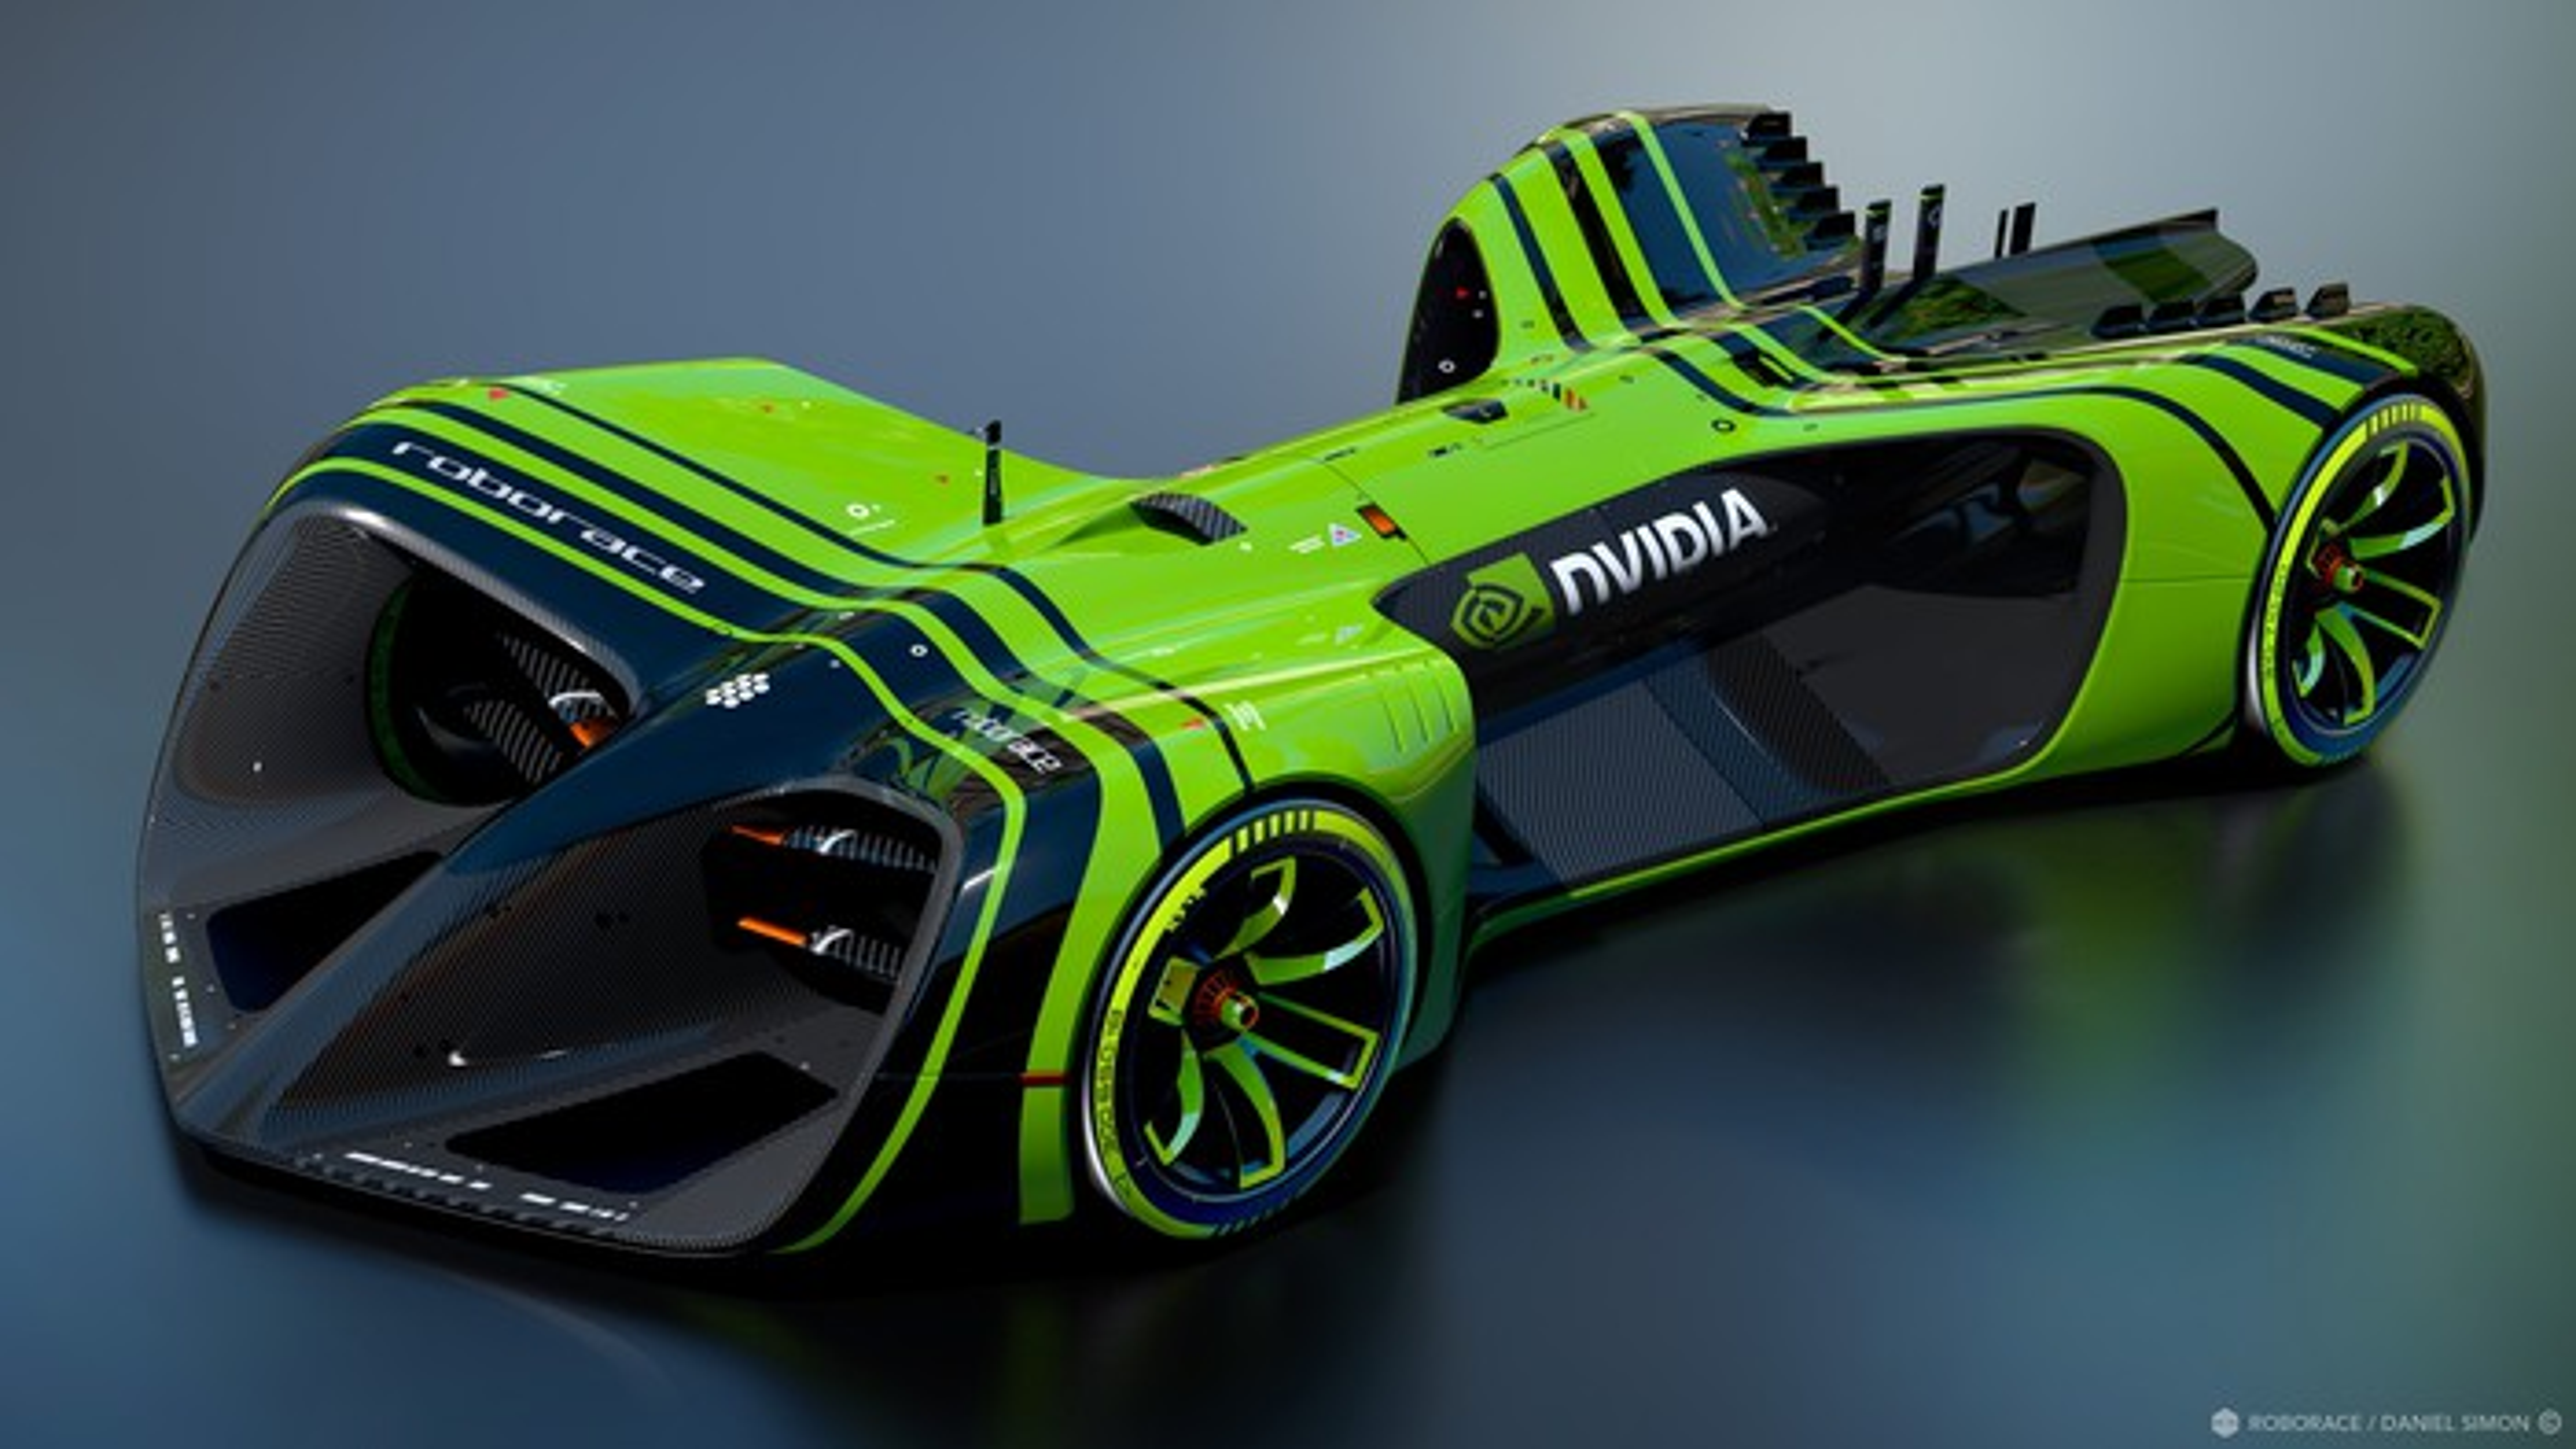 NVIDIA's DRIVE PX 2 powered Roborace vehicle.